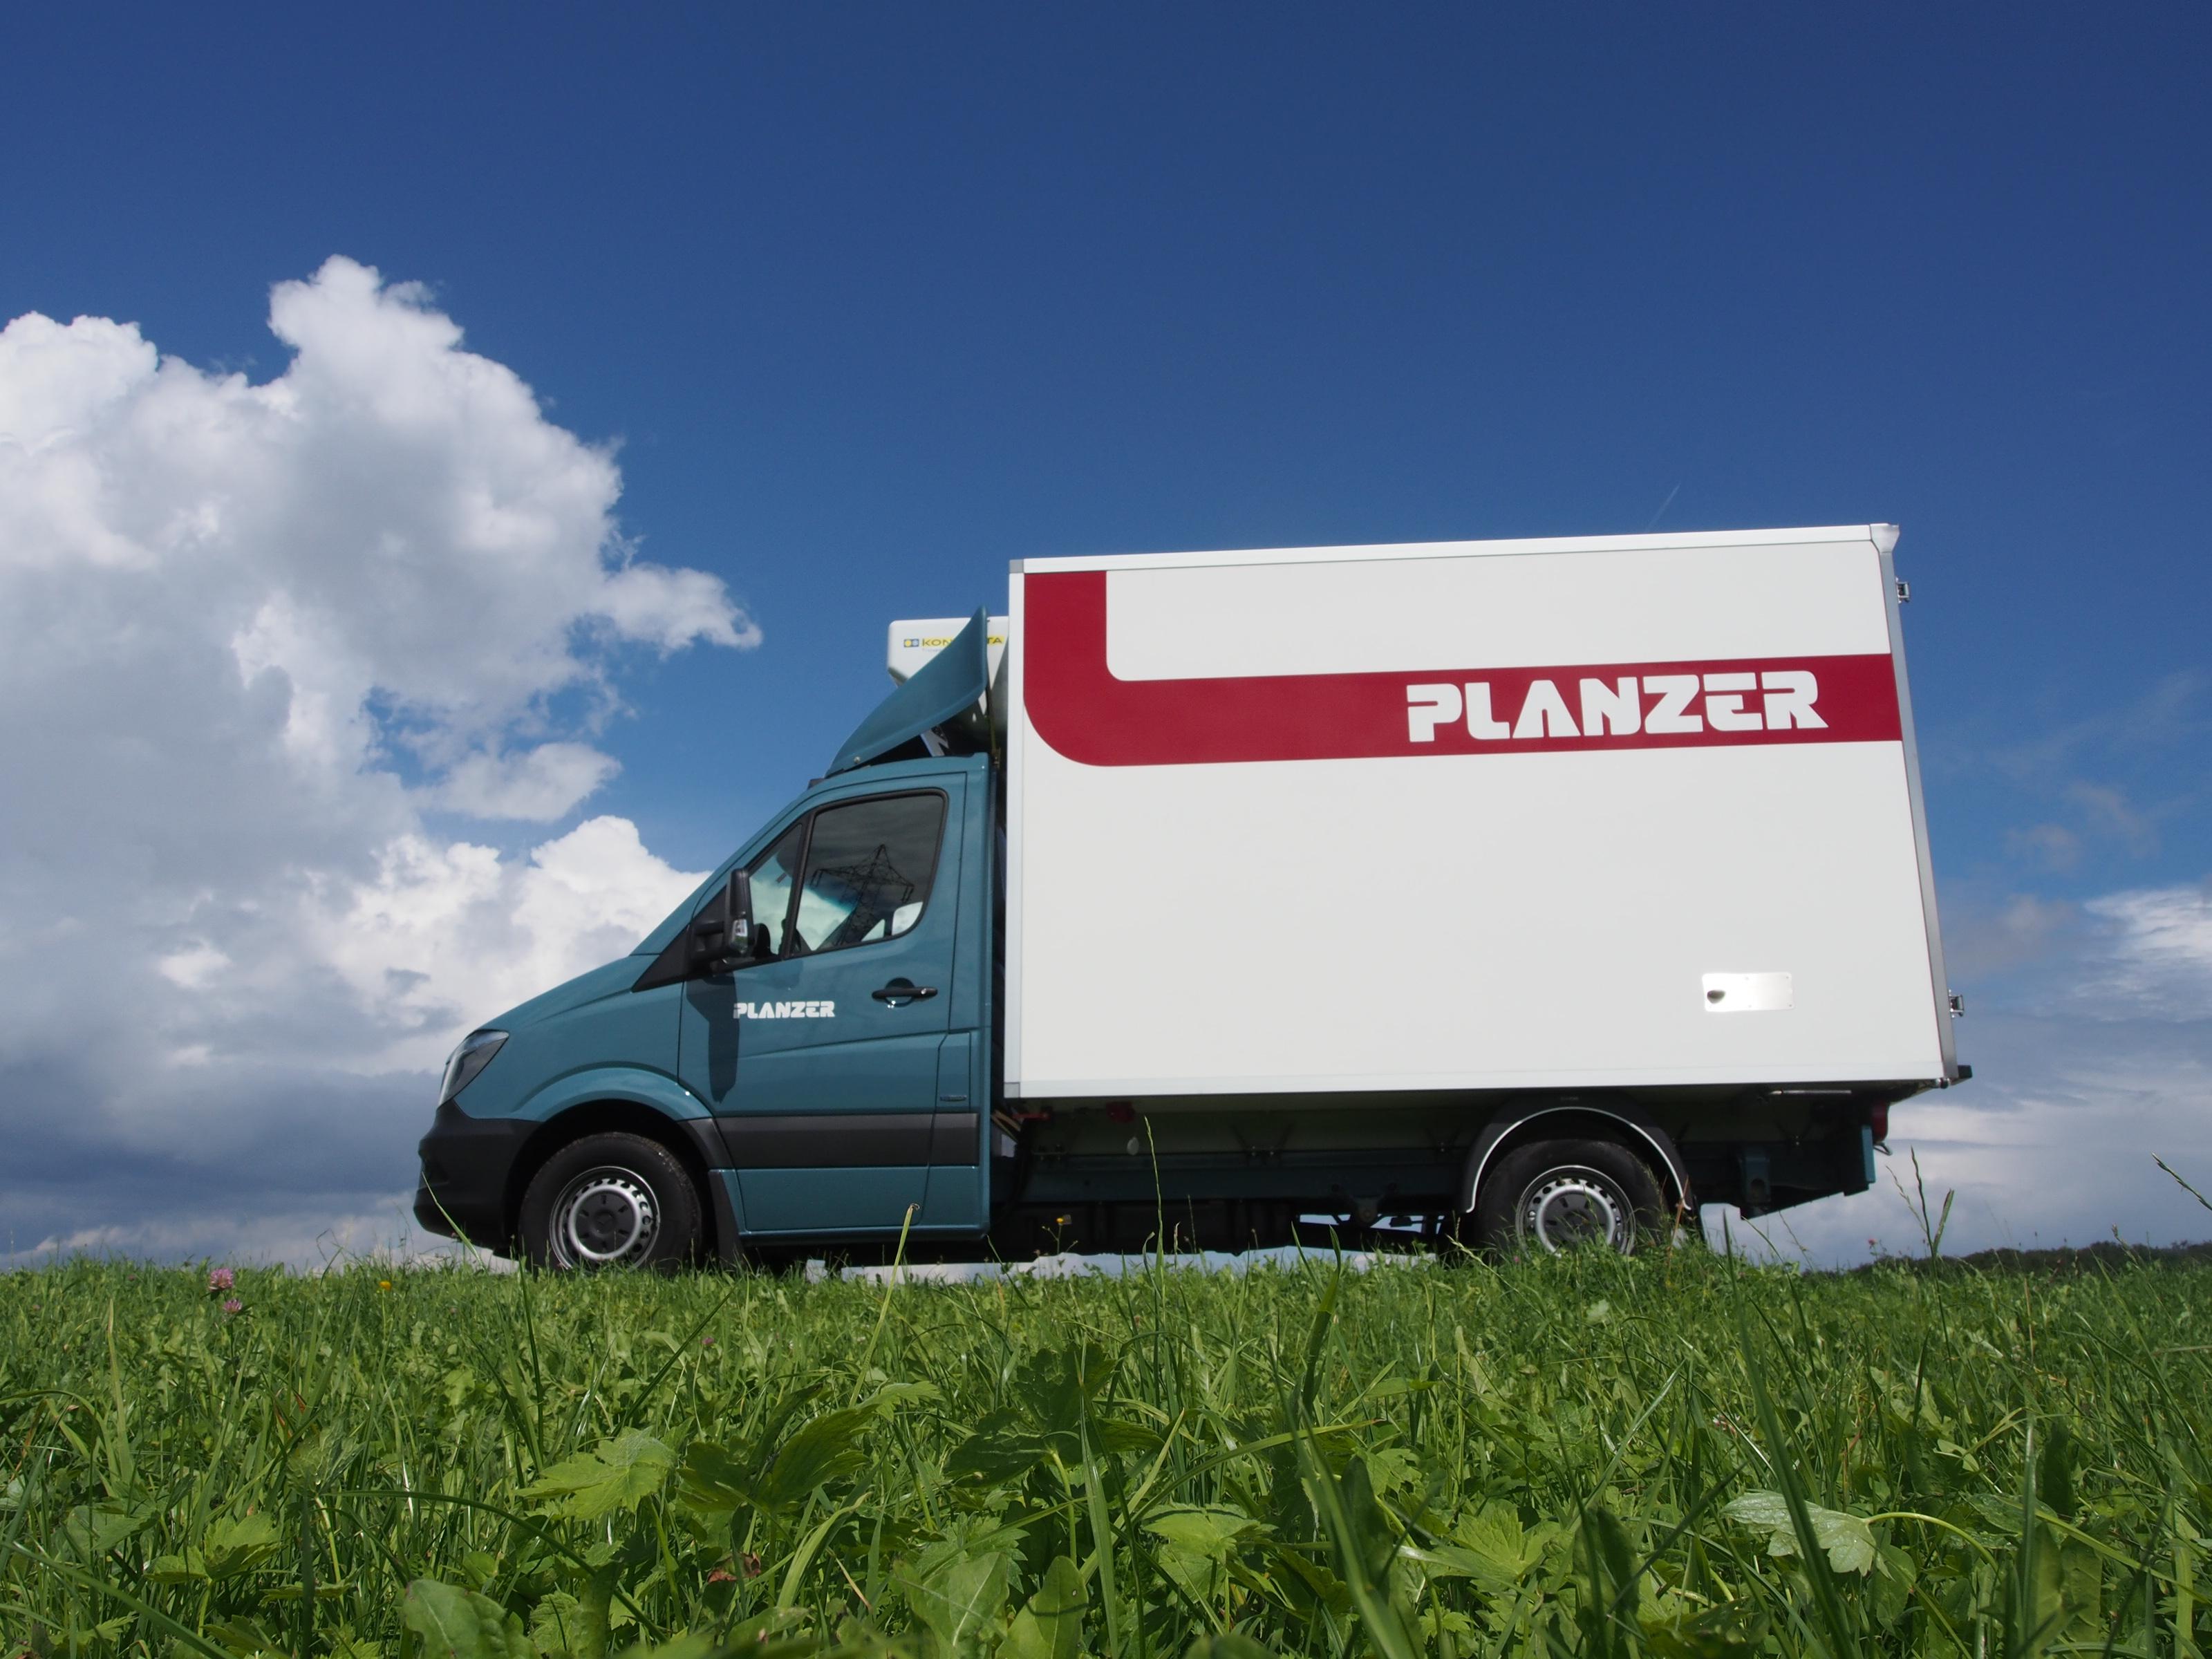 Planzer Kühlfahrzeug